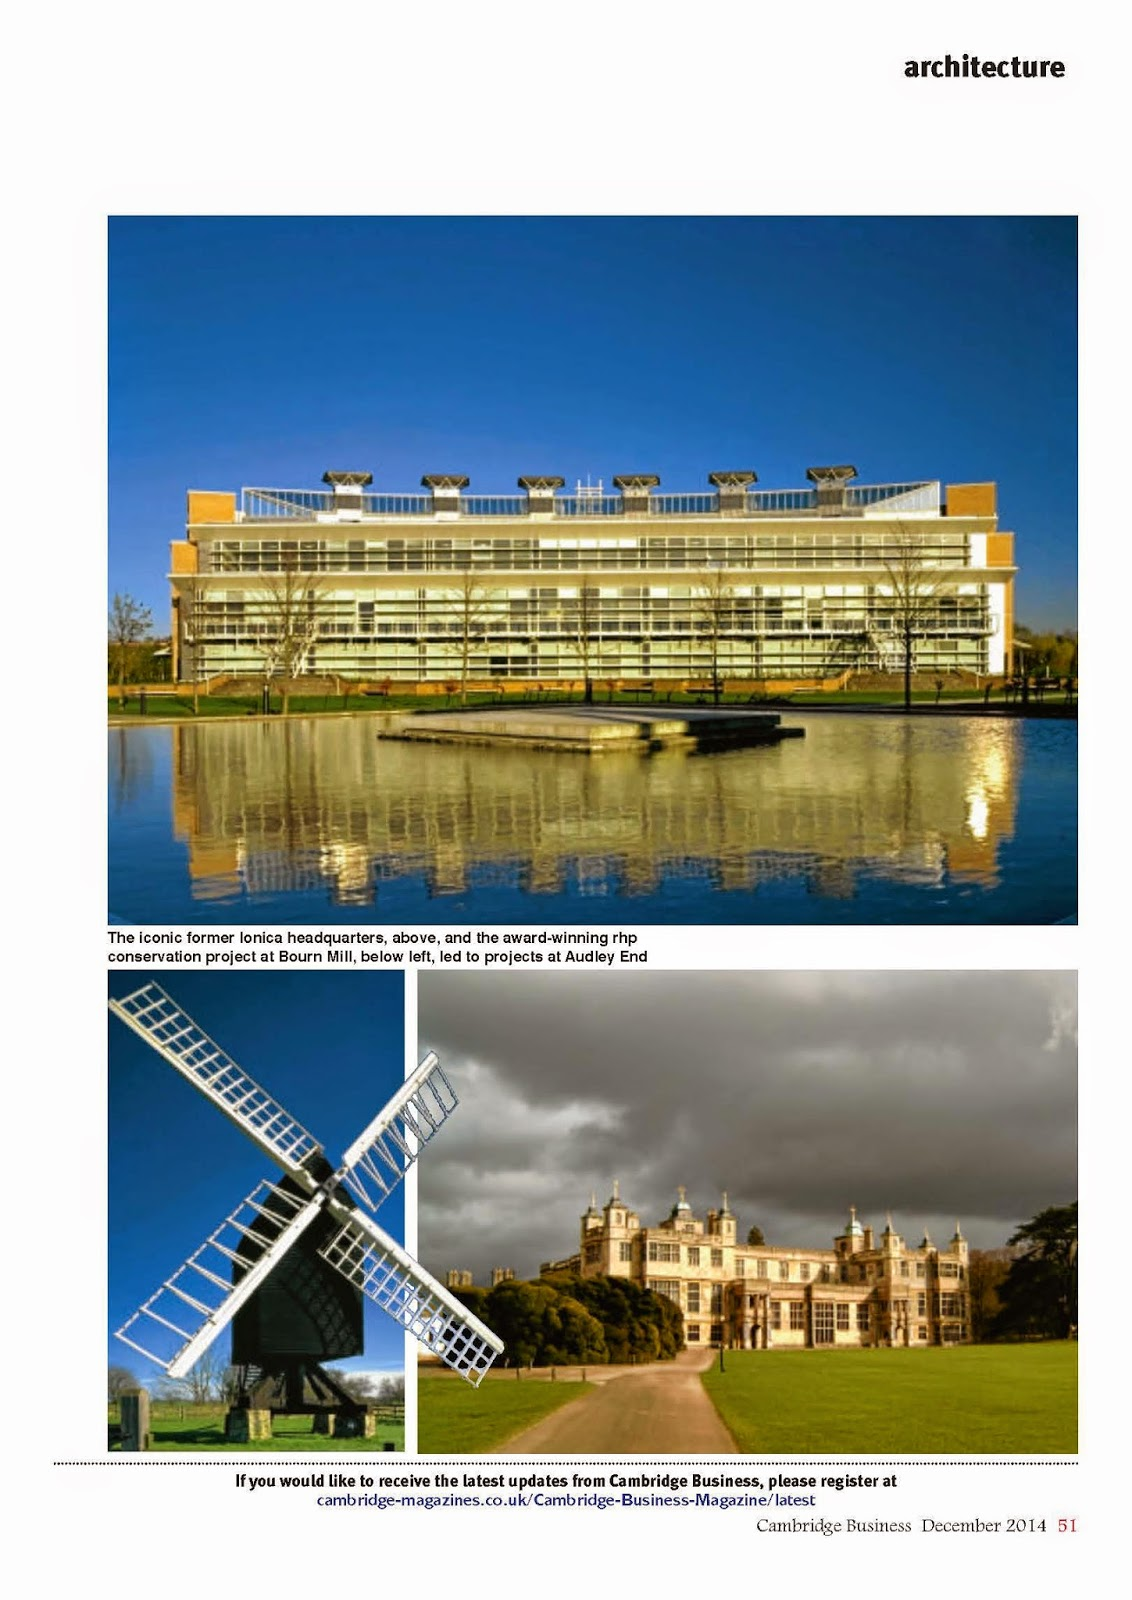 Cambridge Business Magazine Celebrates 40 Years of rhp